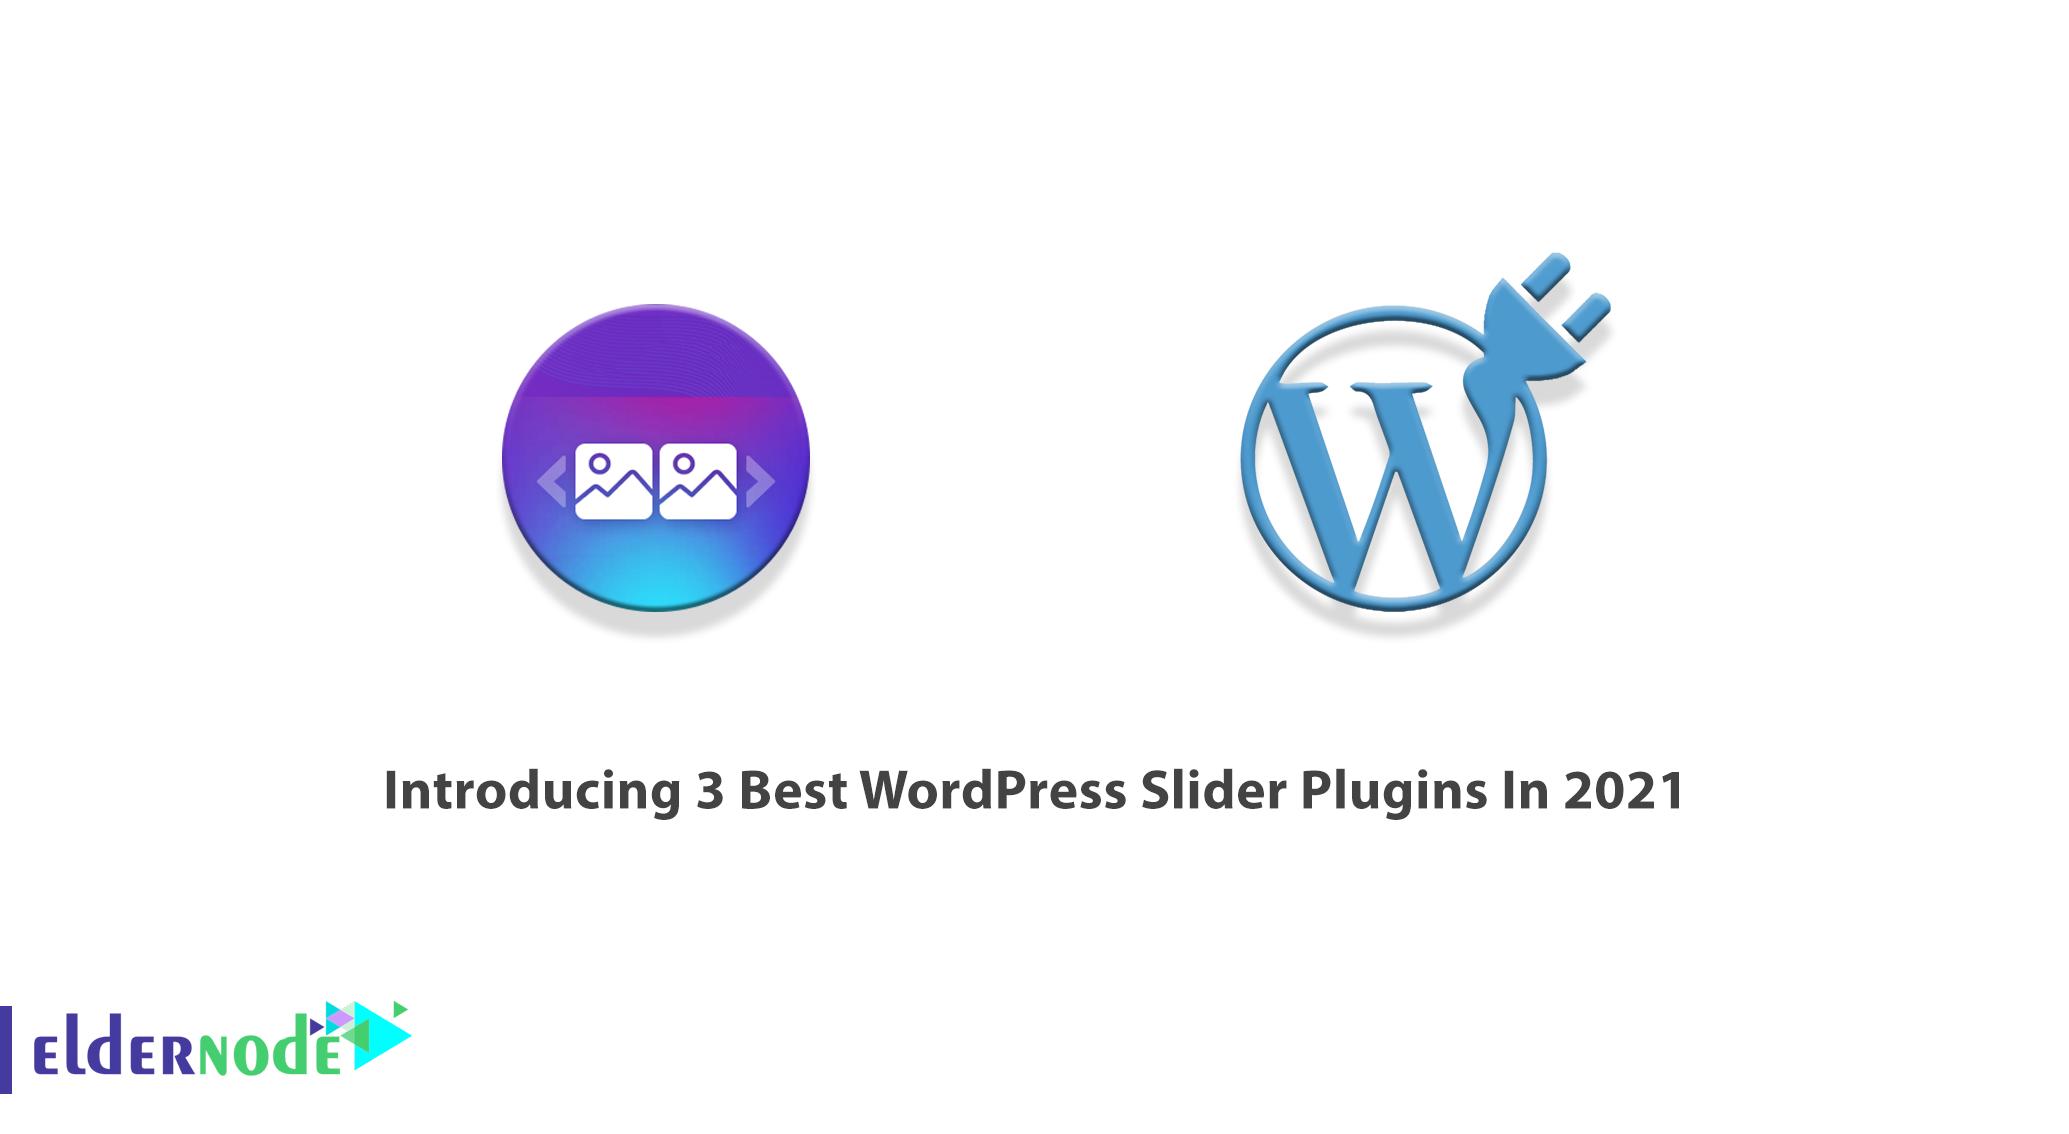 Introducing 3 Best WordPress Slider Plugins In 2021